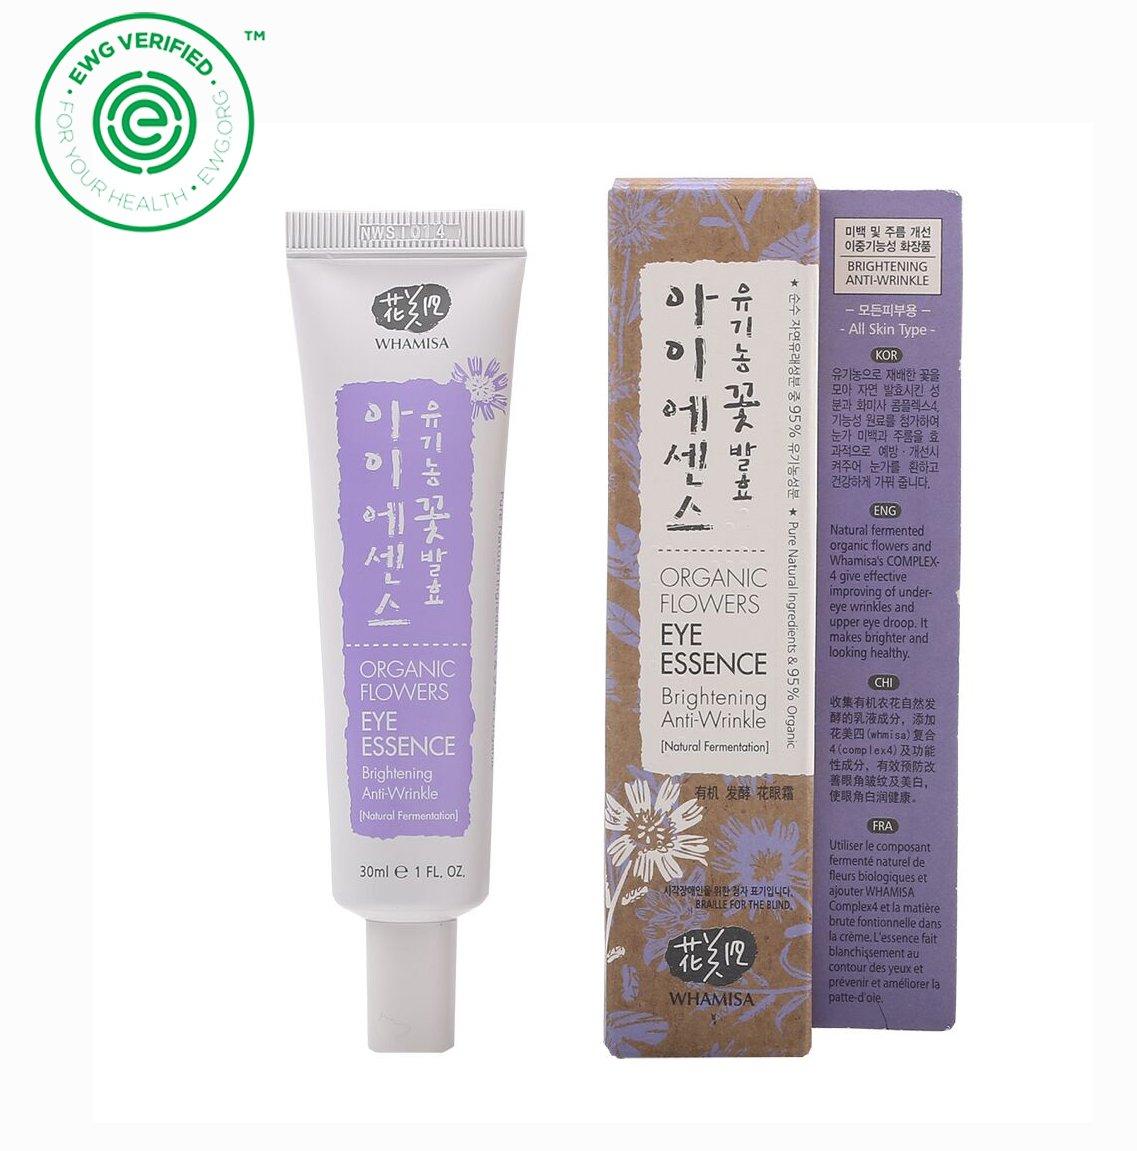 Whamisa Organic Flowers Eye Essence 30ml, 1.01 fl. oz., Anti Wrinkle, Lifting, Brightening, Moisturizing - Naturally fermented, EWG Verified